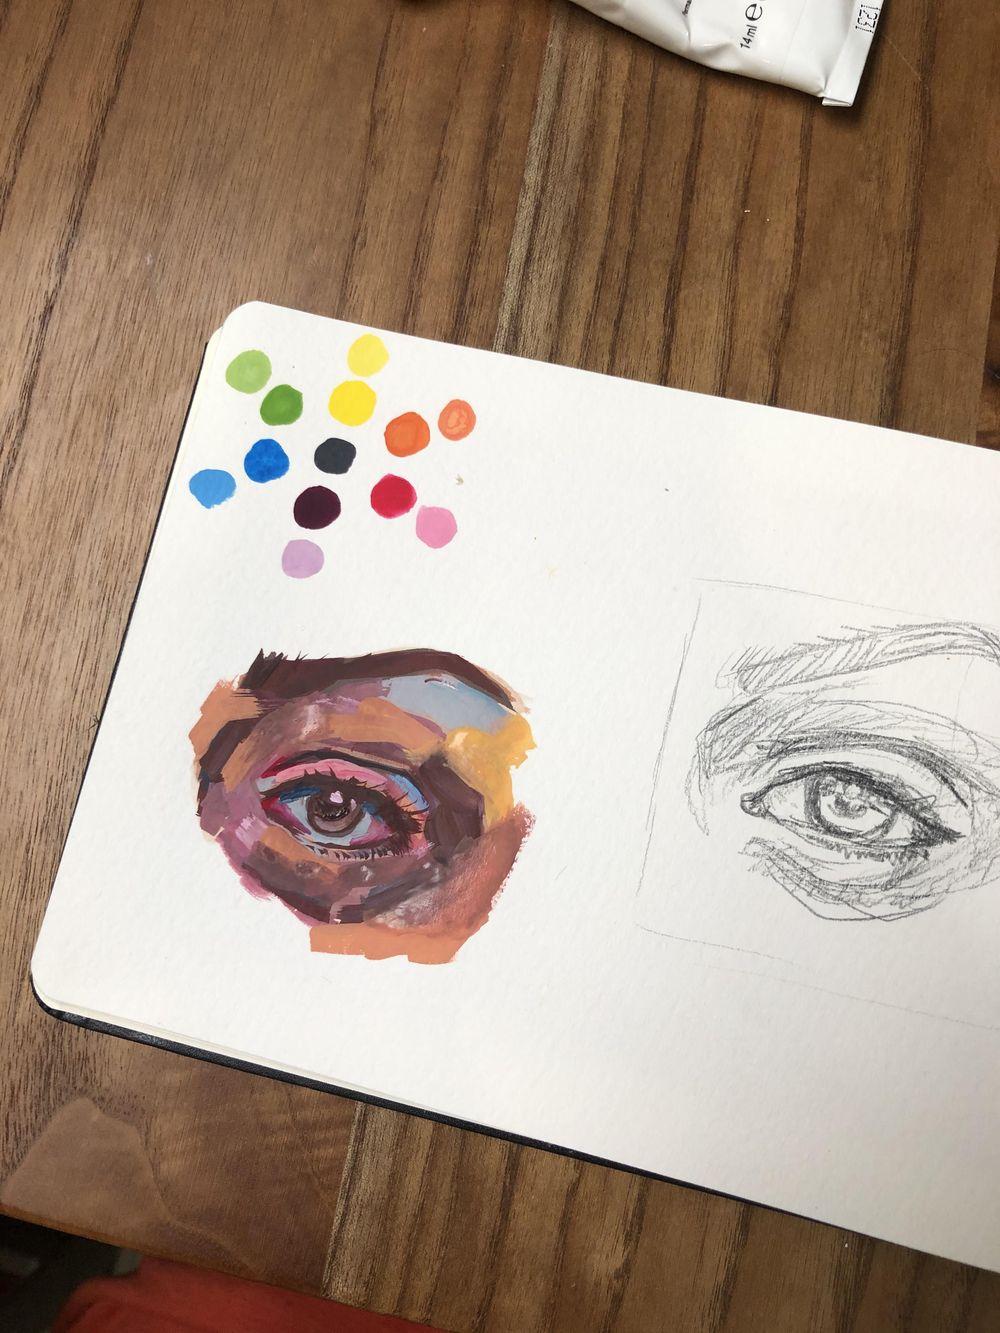 Gouache eye - image 1 - student project